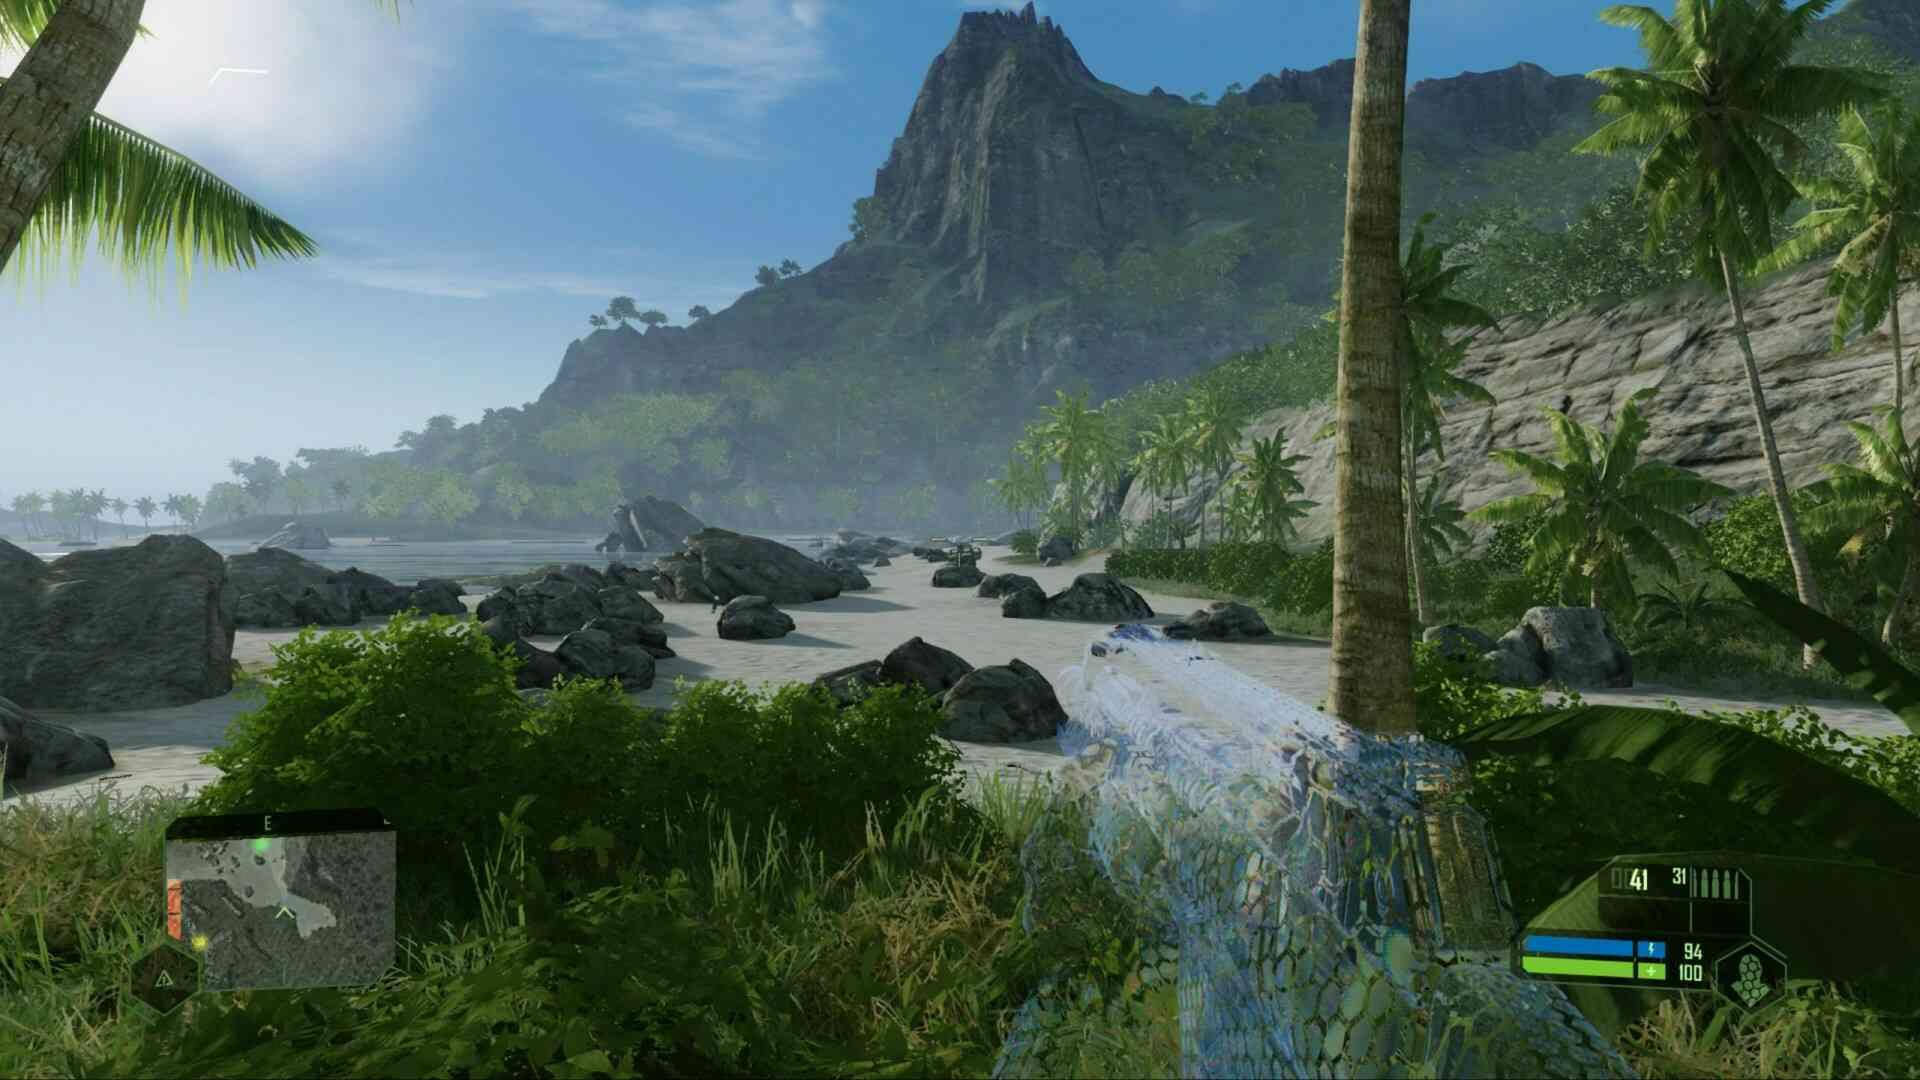 https://www.oyunindir.vip/wp-content/uploads/2020/09/Crysis-Remastered-indir-full.jpg